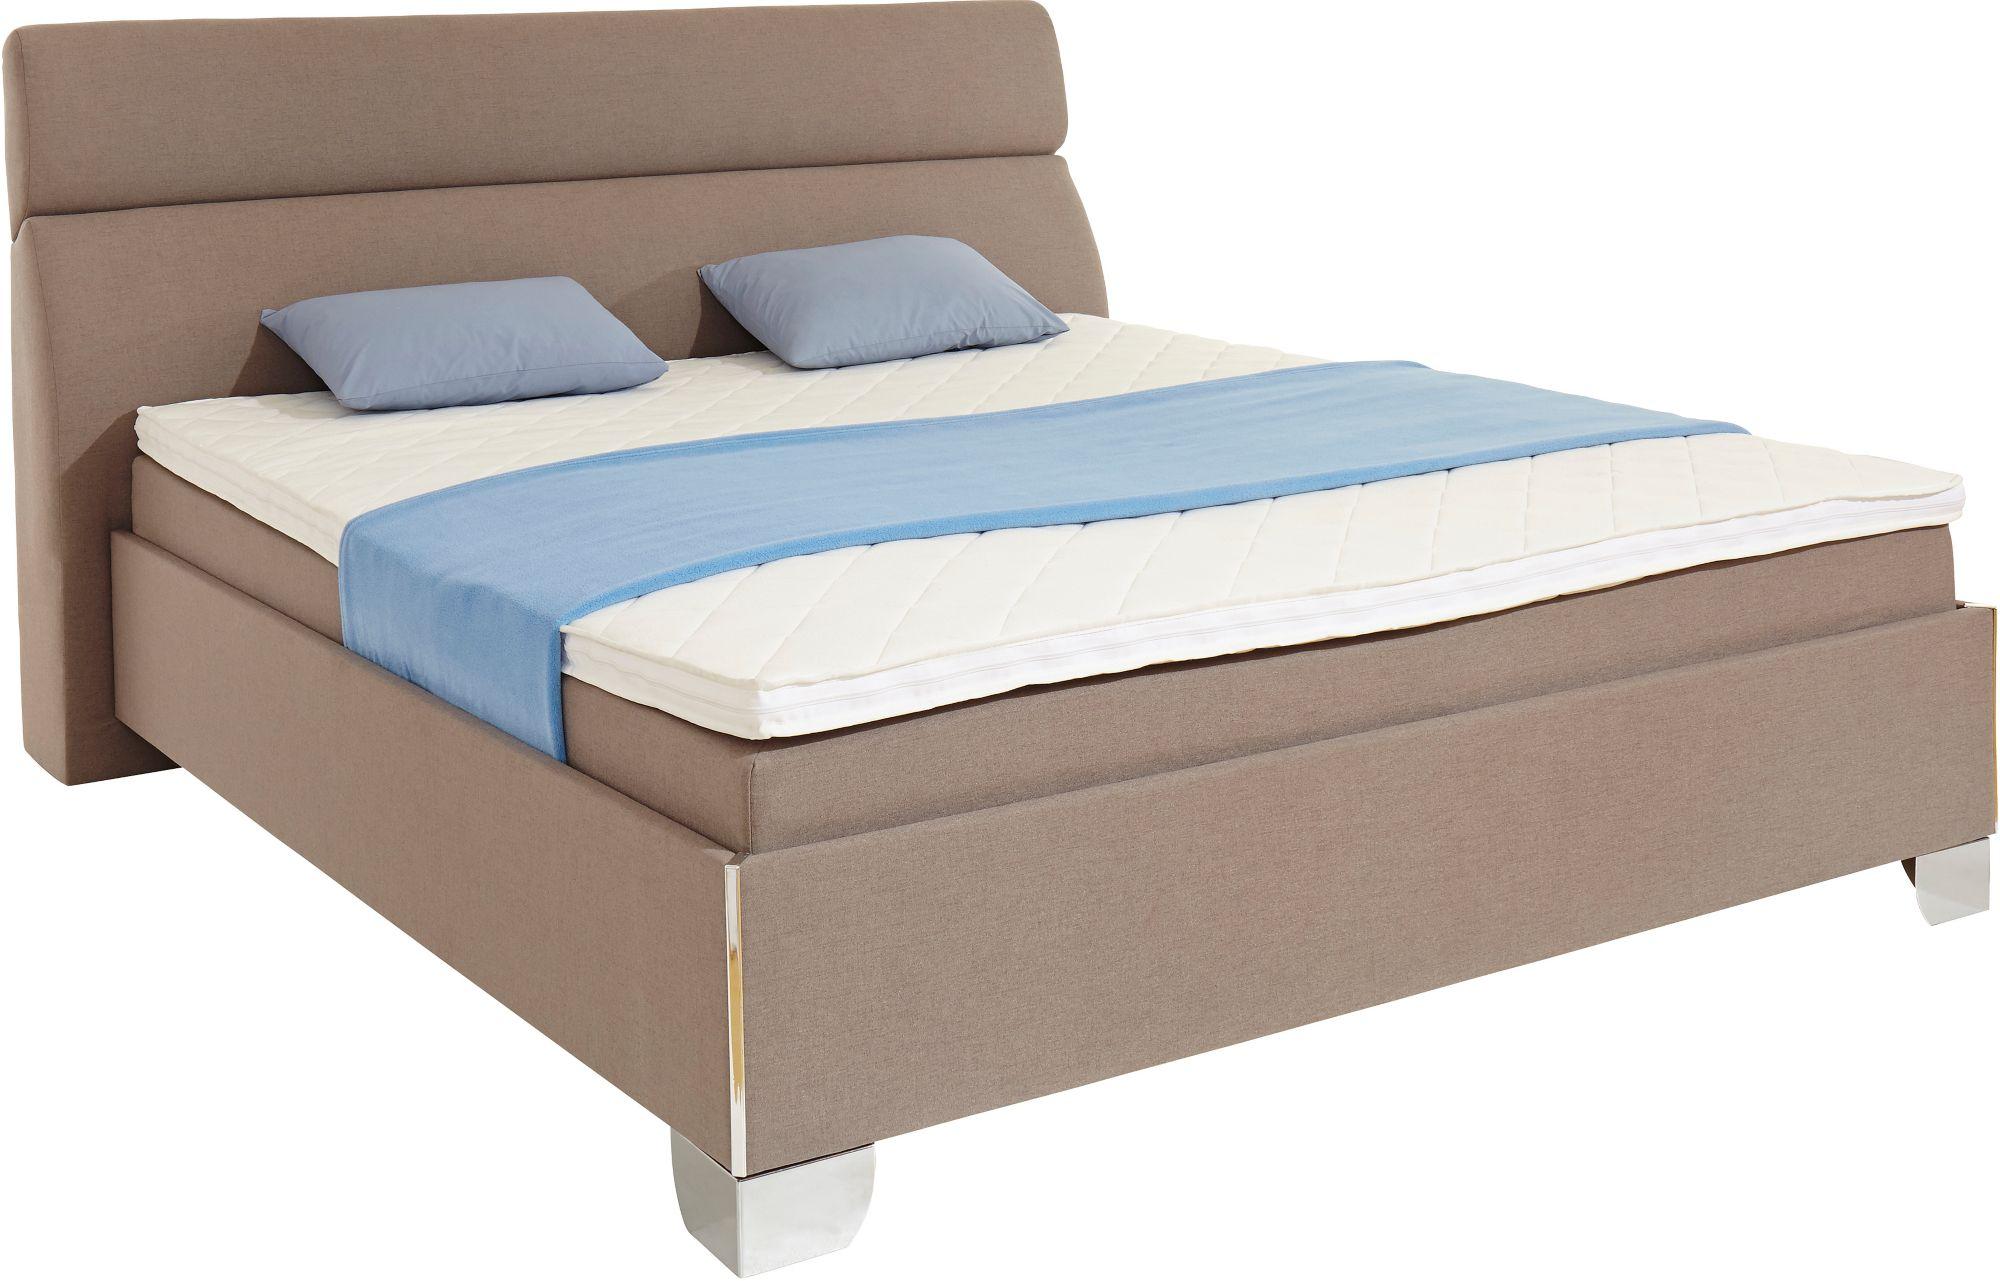 matraflex boxspringbett schwab versand wohnw nde. Black Bedroom Furniture Sets. Home Design Ideas